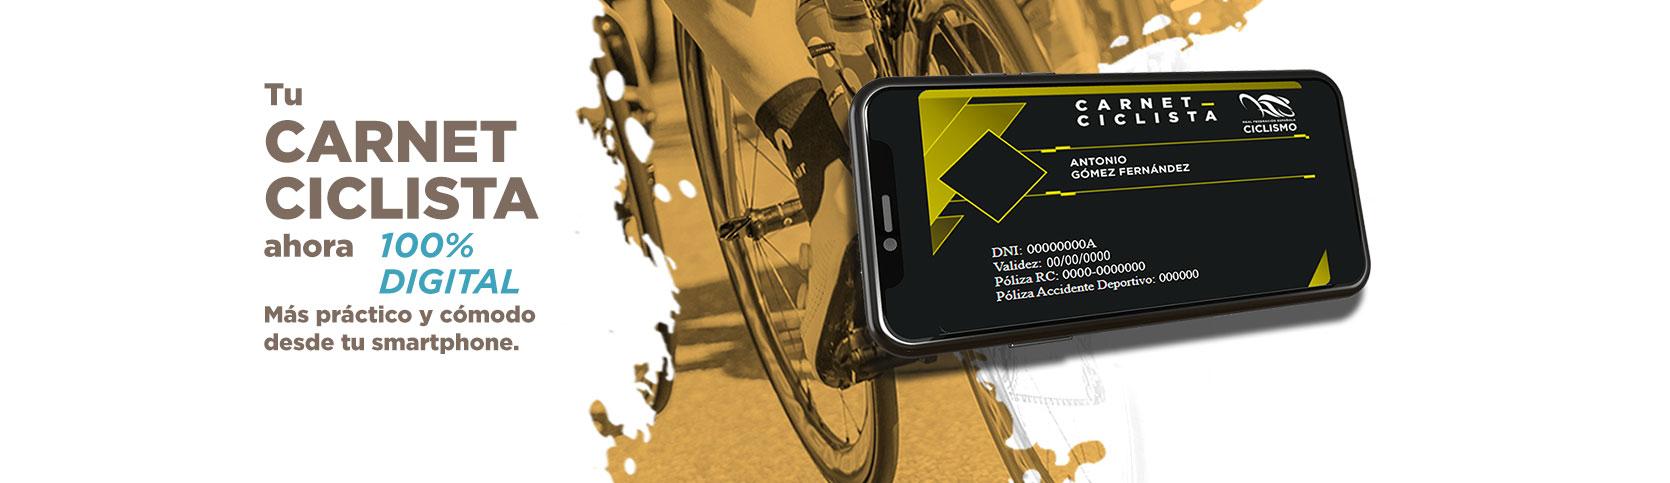 Tu Carnet Ciclista ahora 100% digital.